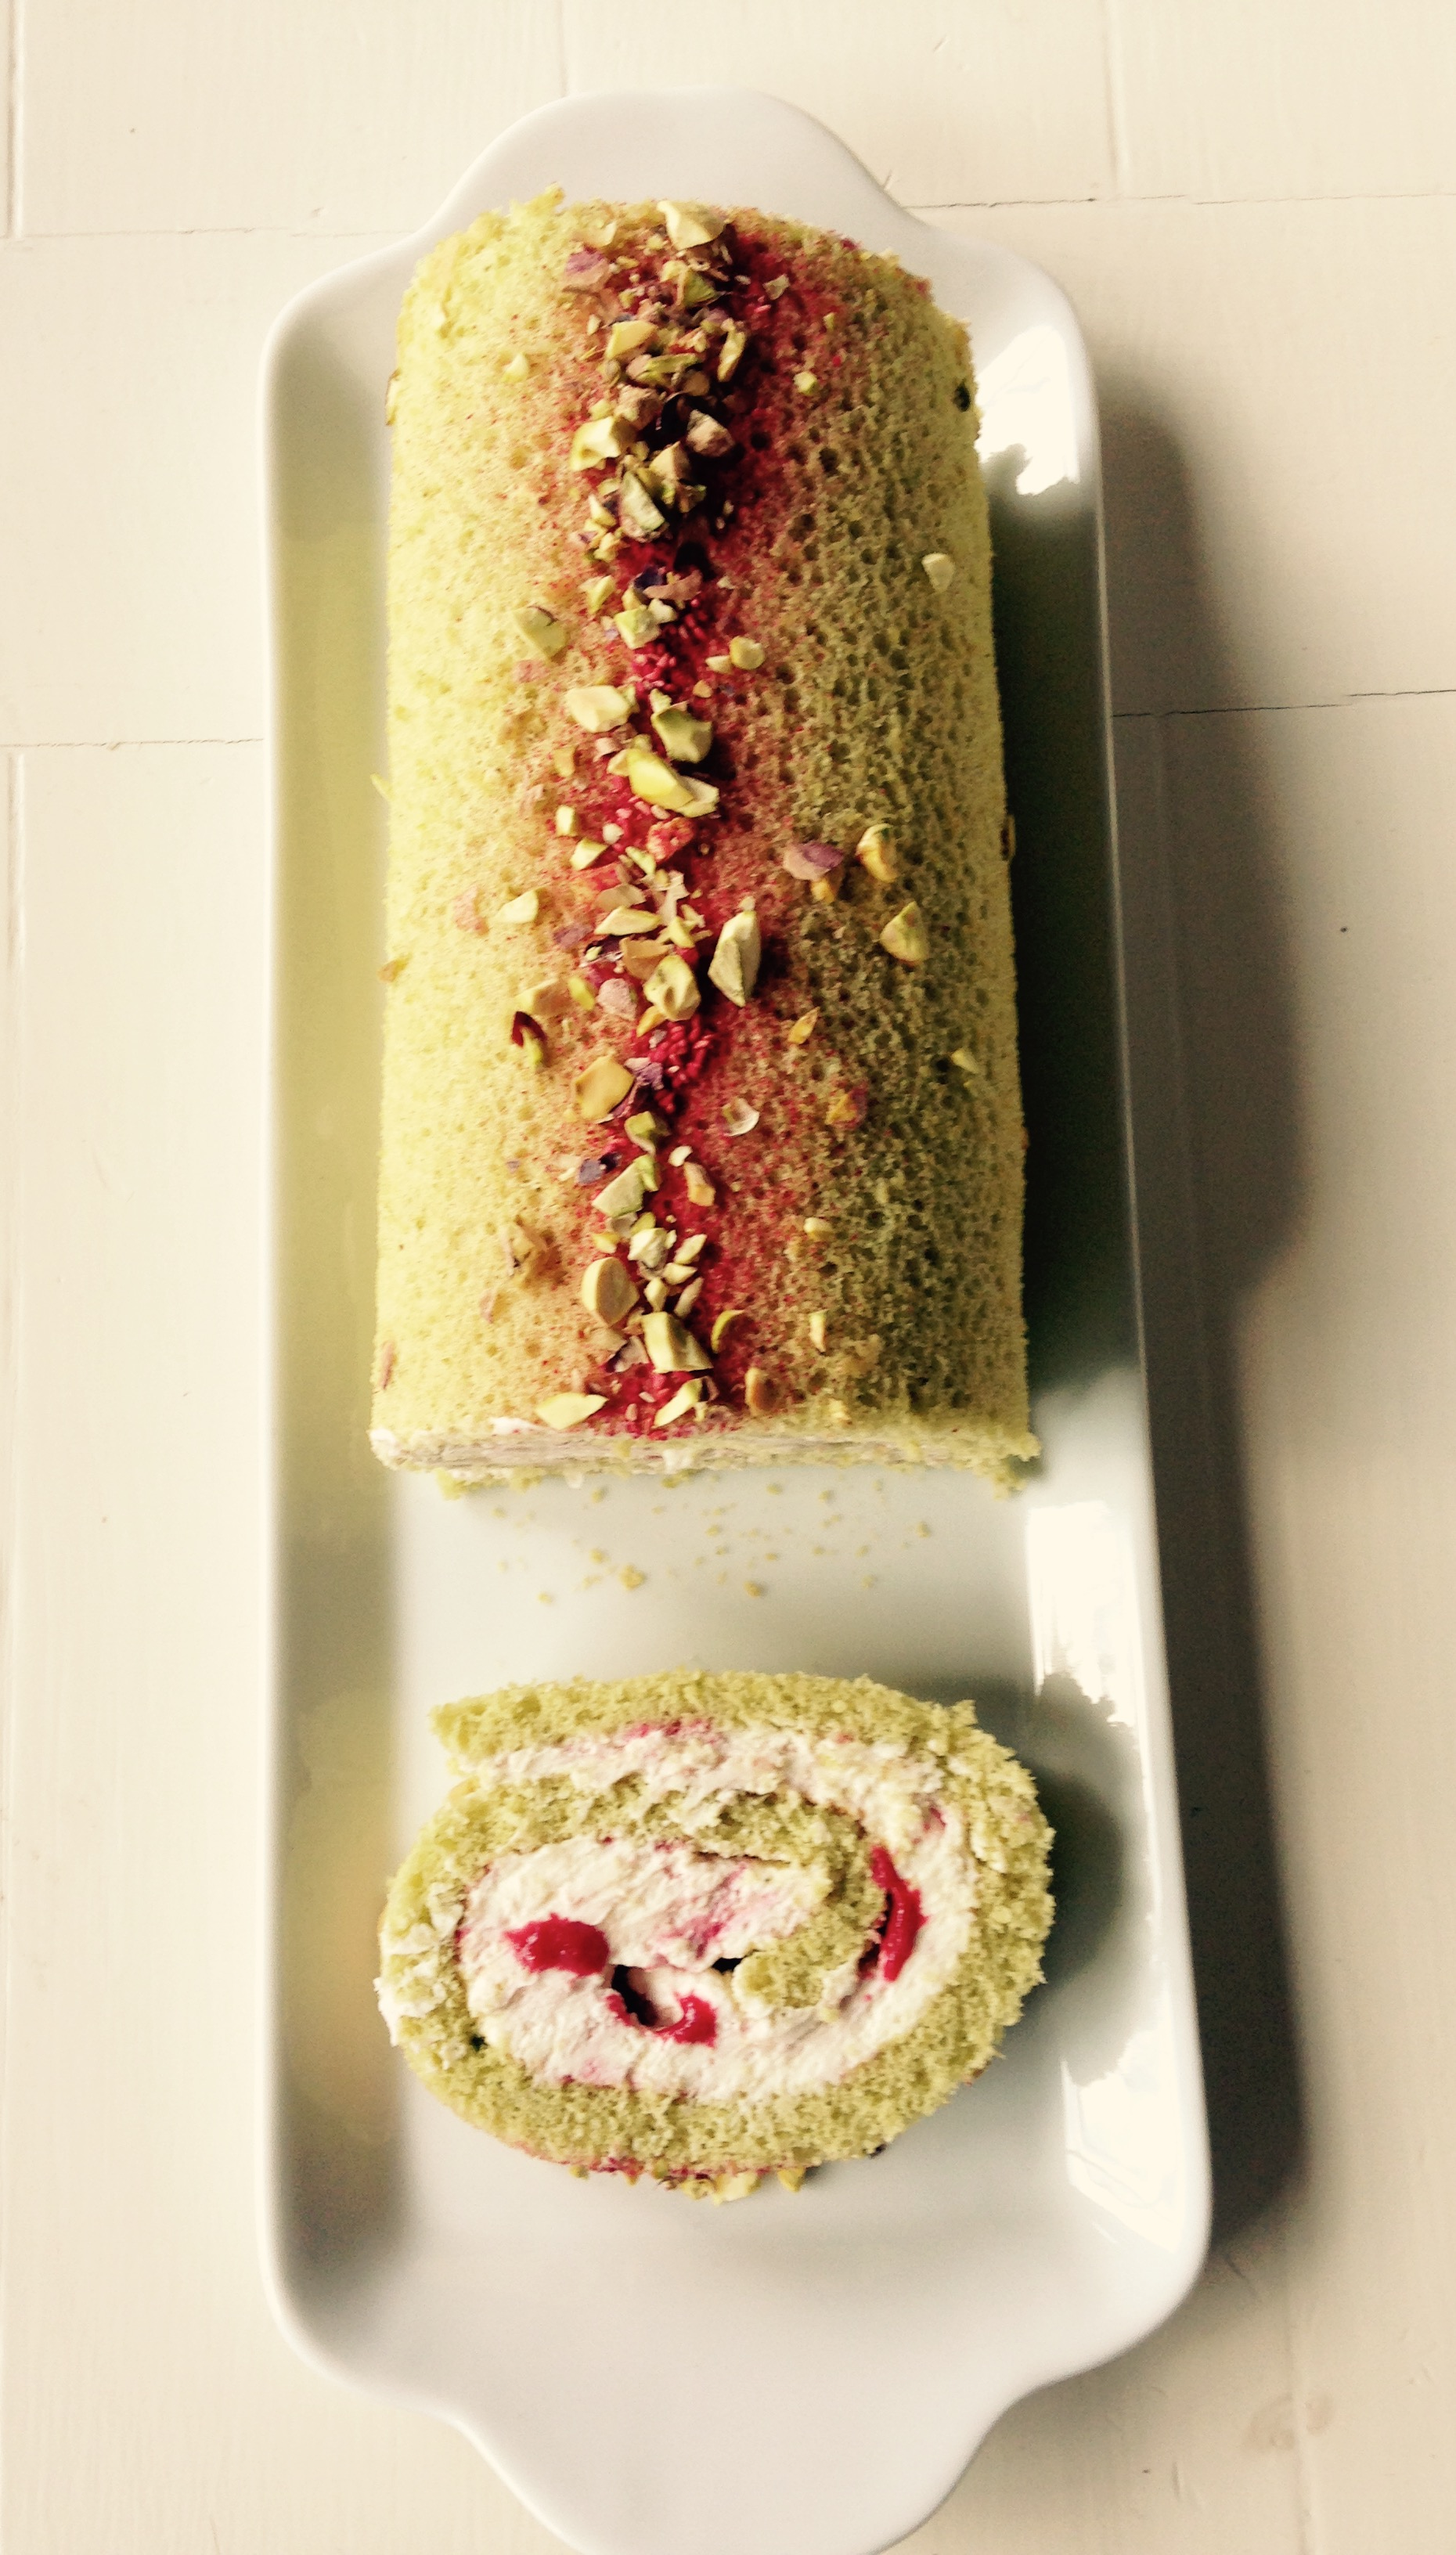 Pistachio and Raspberry Ripple Swiss Roll